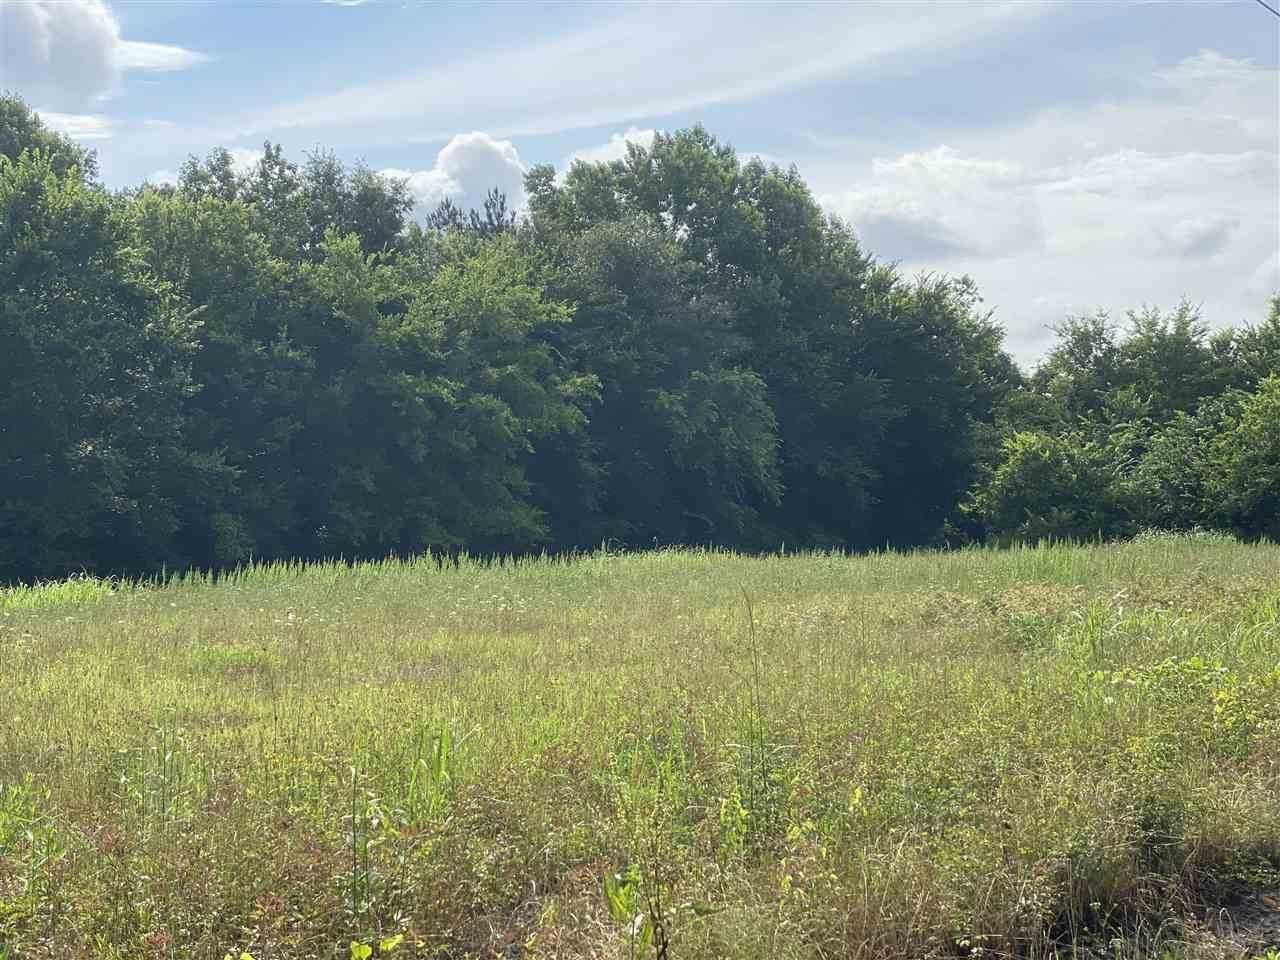 TBD Starnes (Esmt) St 4+/- Acres - Photo 1